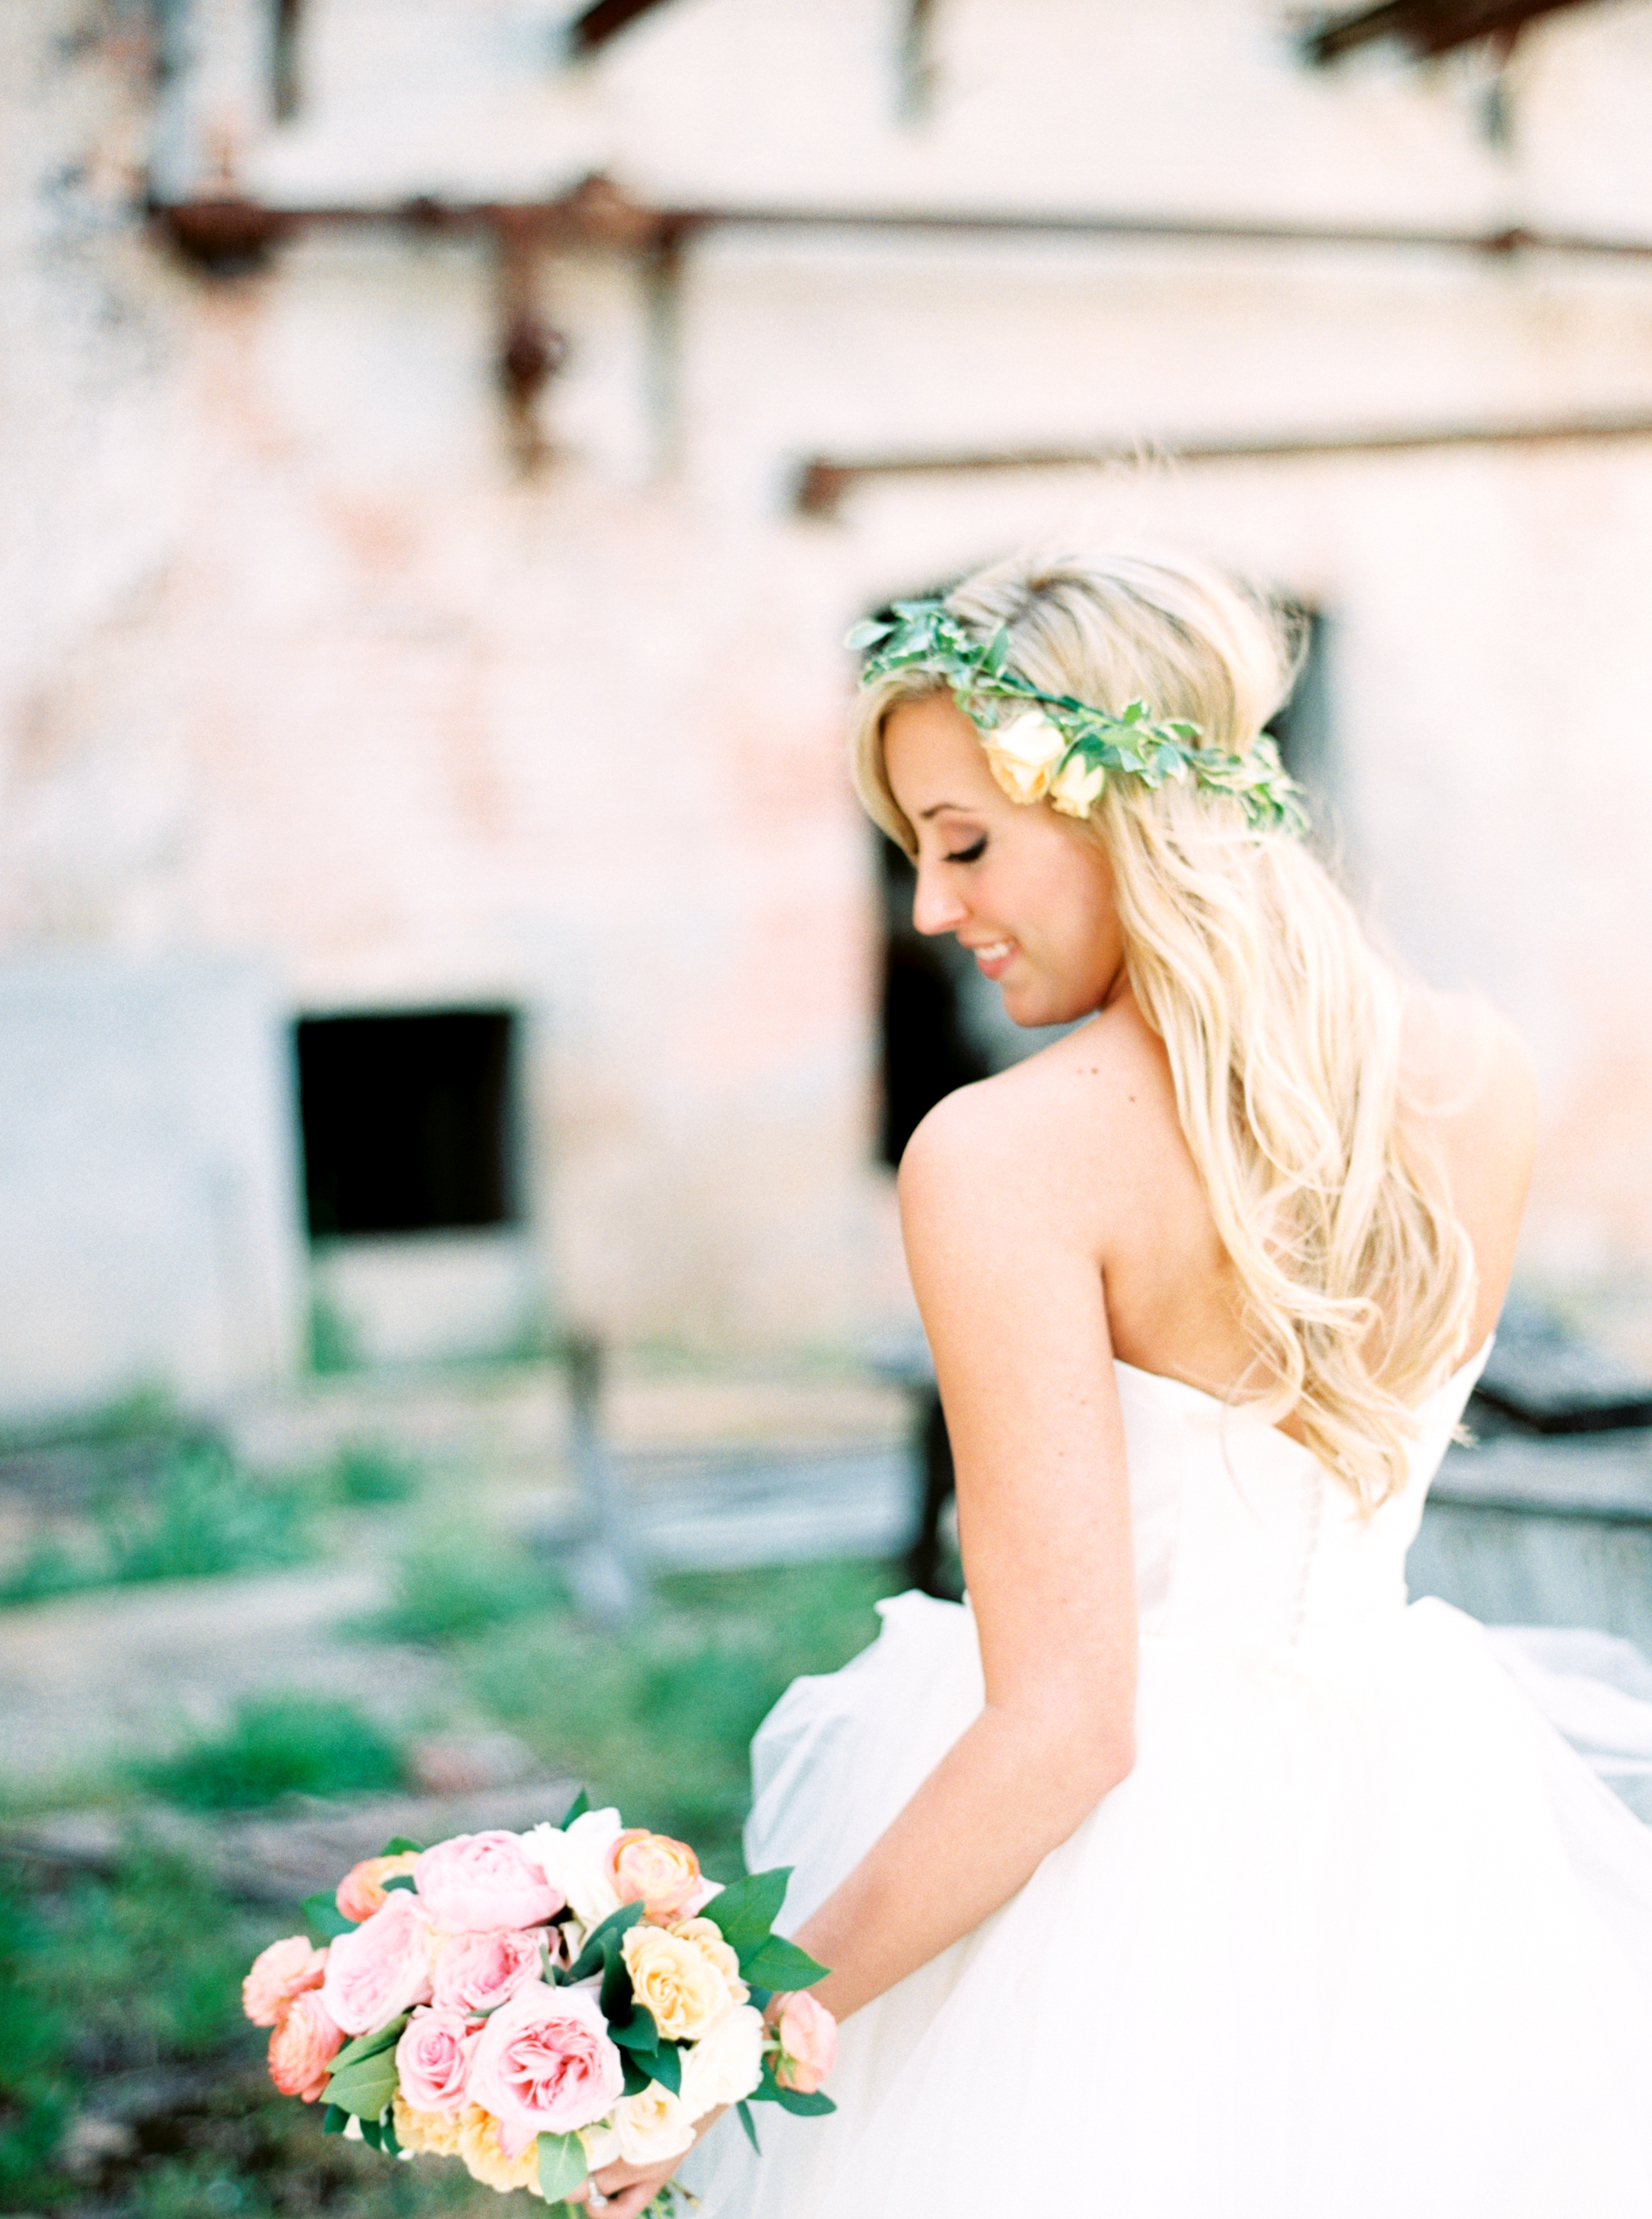 Nicole Berrett Photography